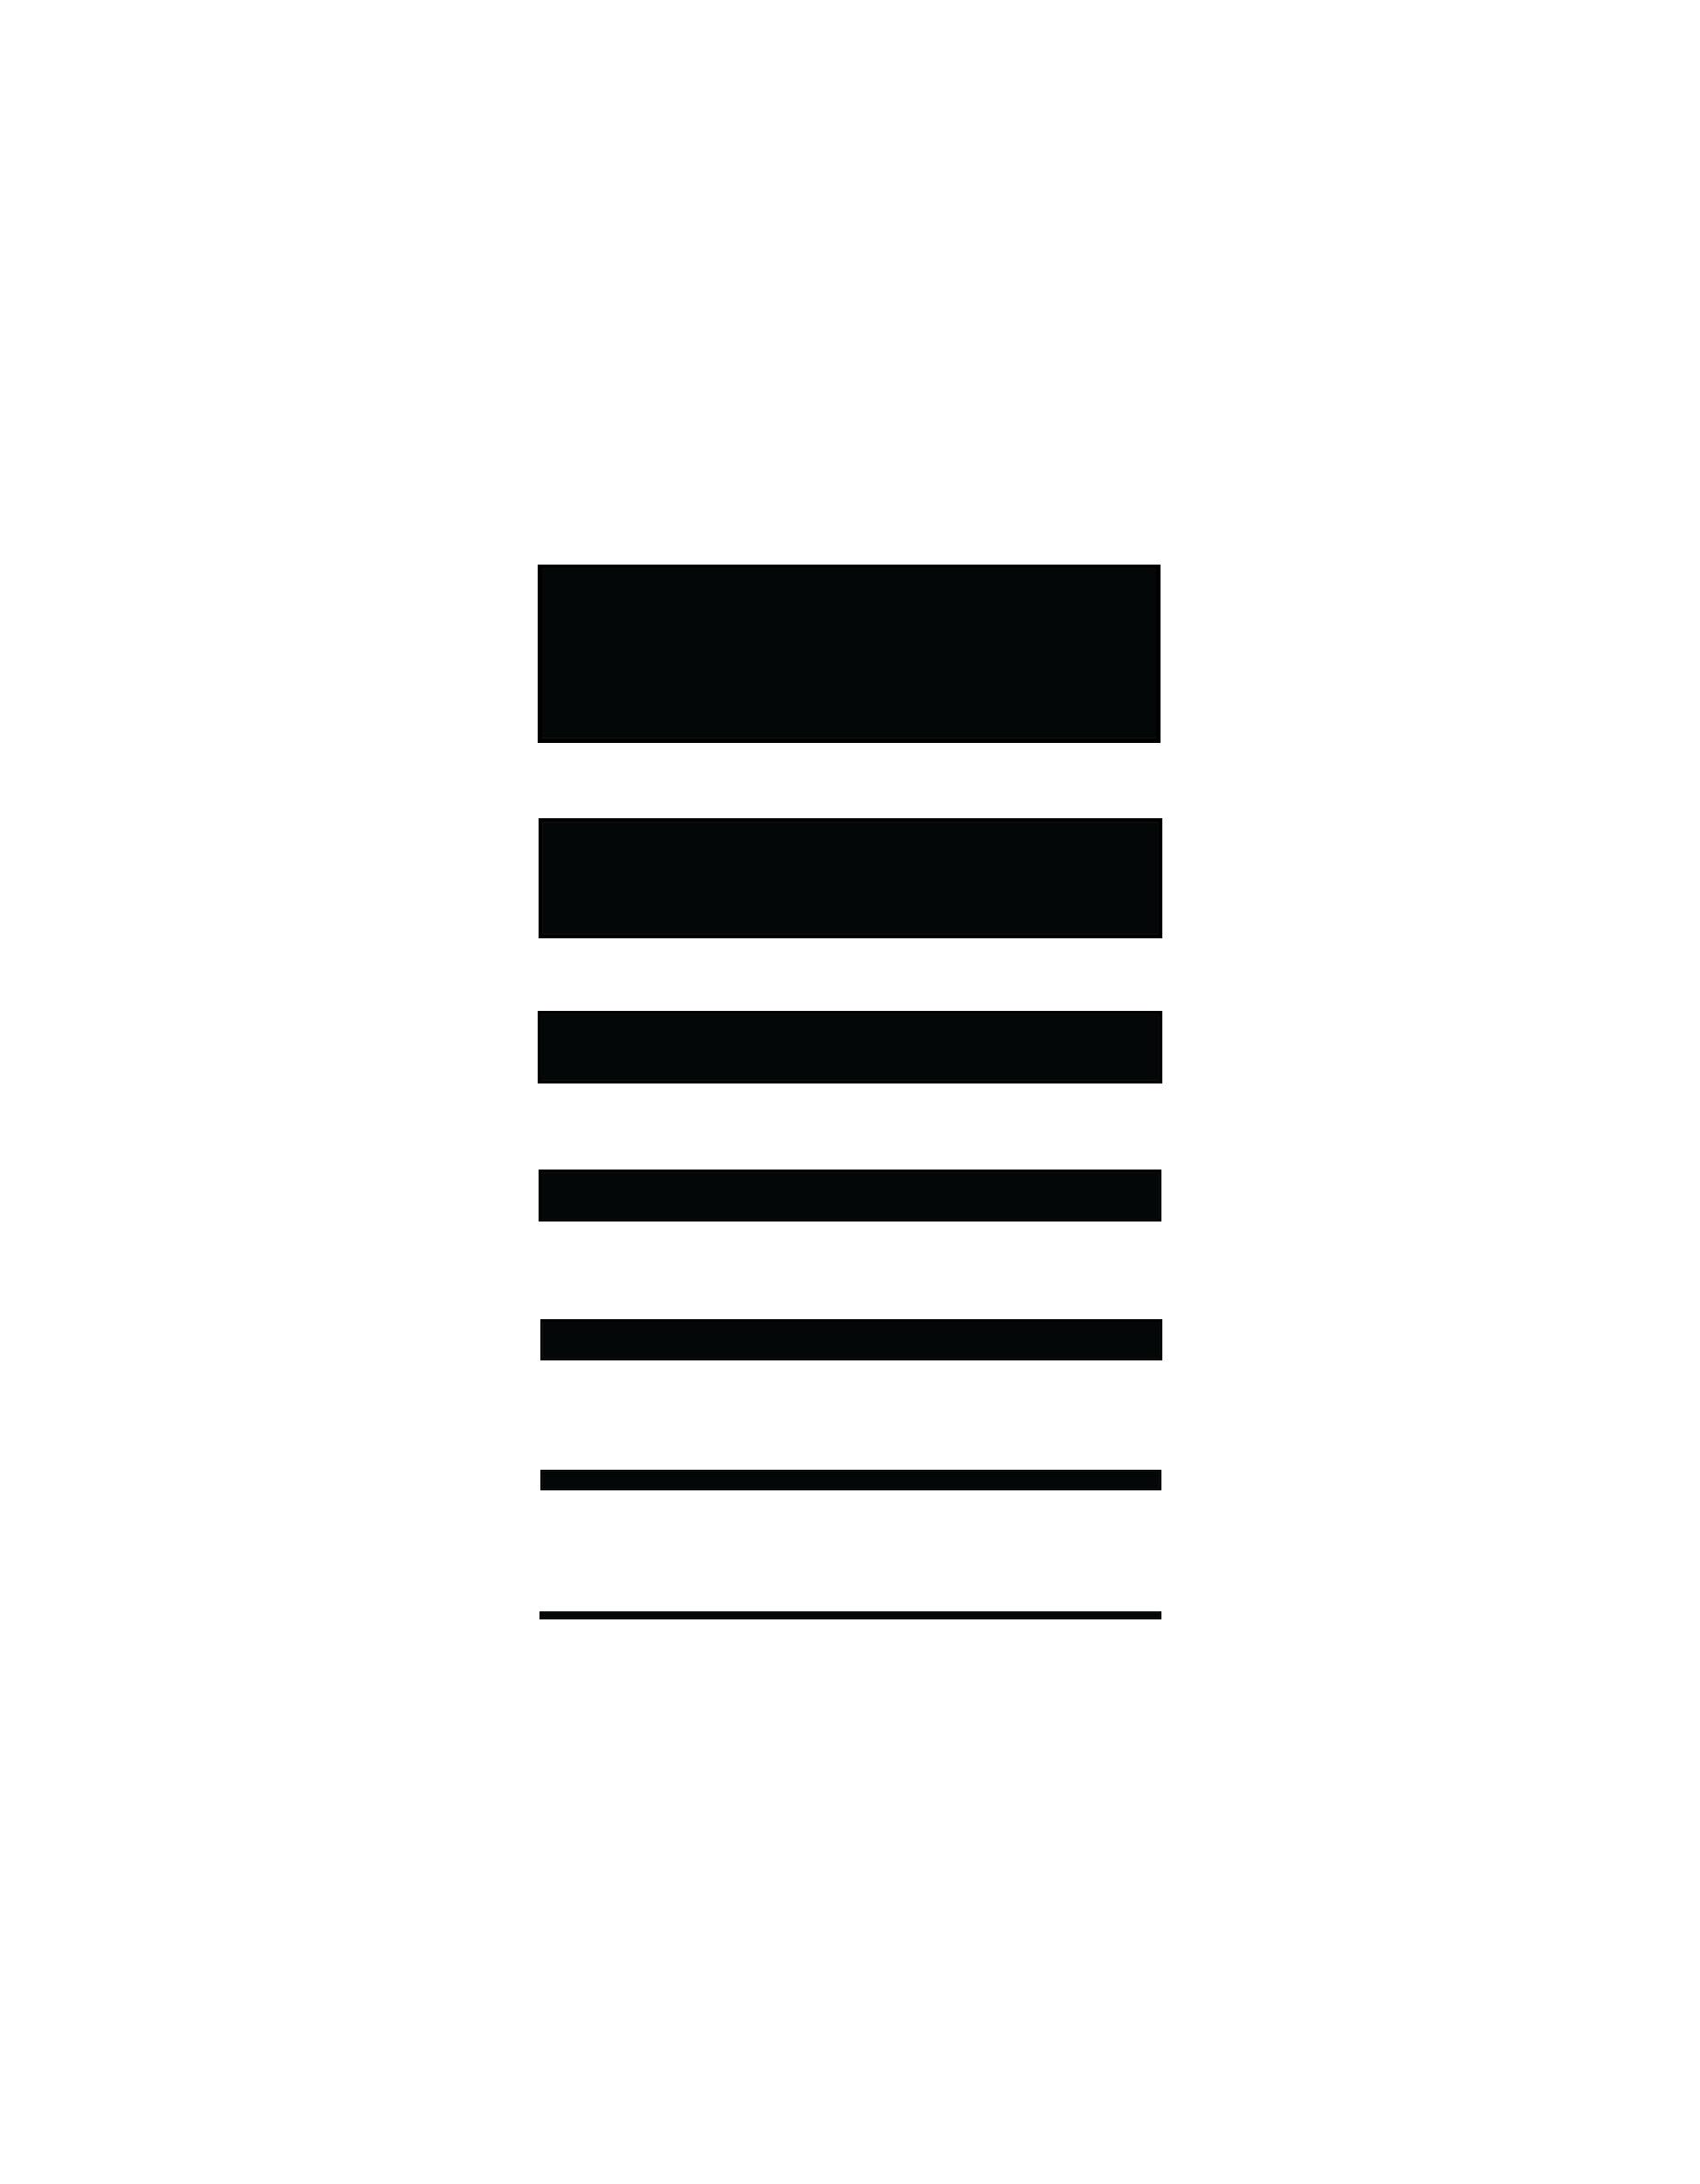 C river logo 5B fall 3 copy.png